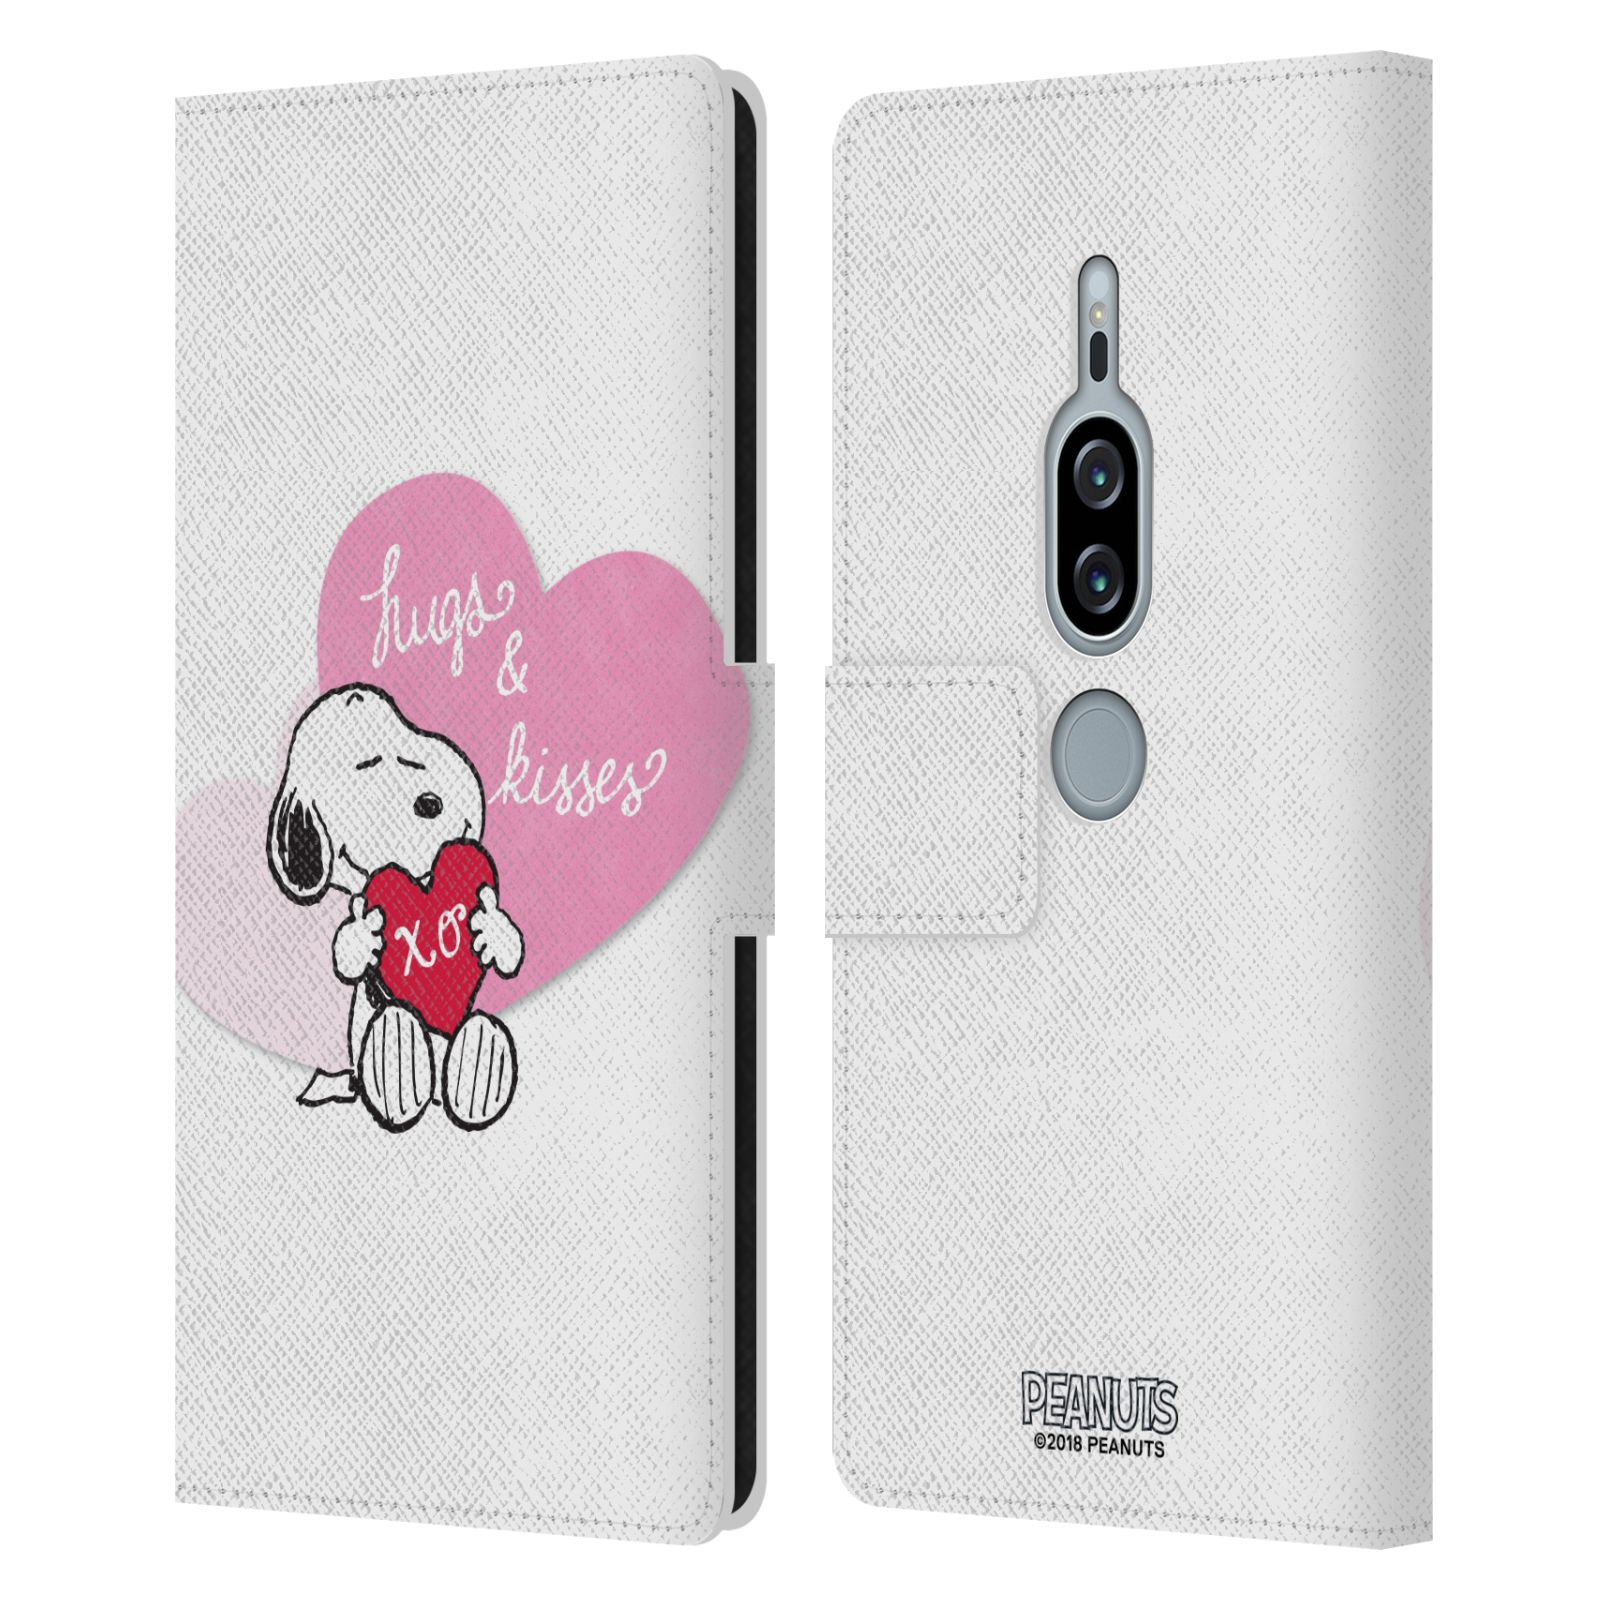 Pouzdro na mobil Sony Xperia XZ2 Premium - Head Case - Peanuts - Snoopy pejsek se srdíčkem